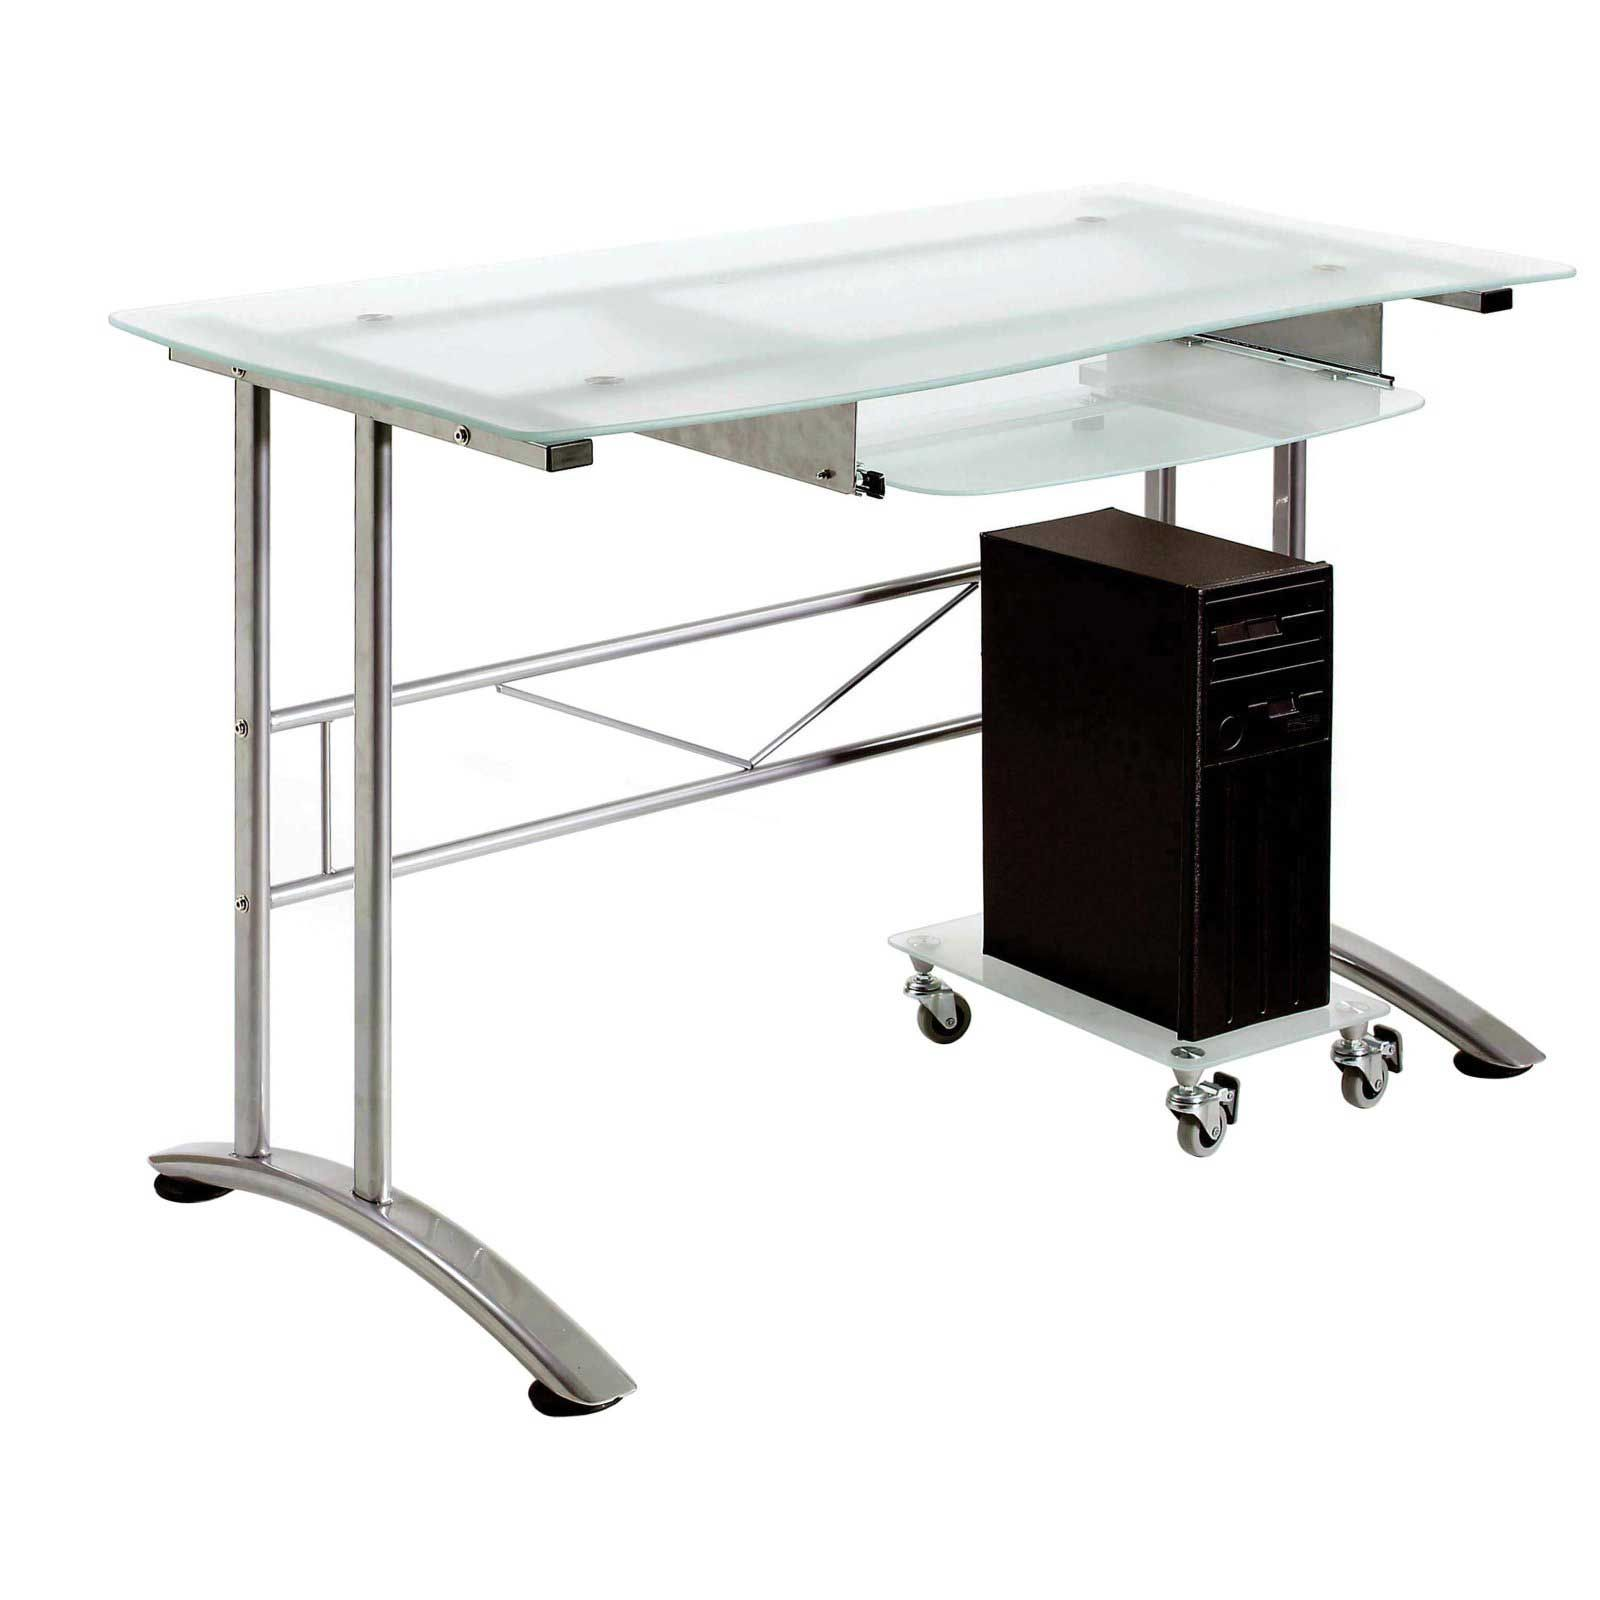 Ital Bjorn Computer Desk With Frosted Glass Design Office Furniture Modern Desk Modern Glass Desk